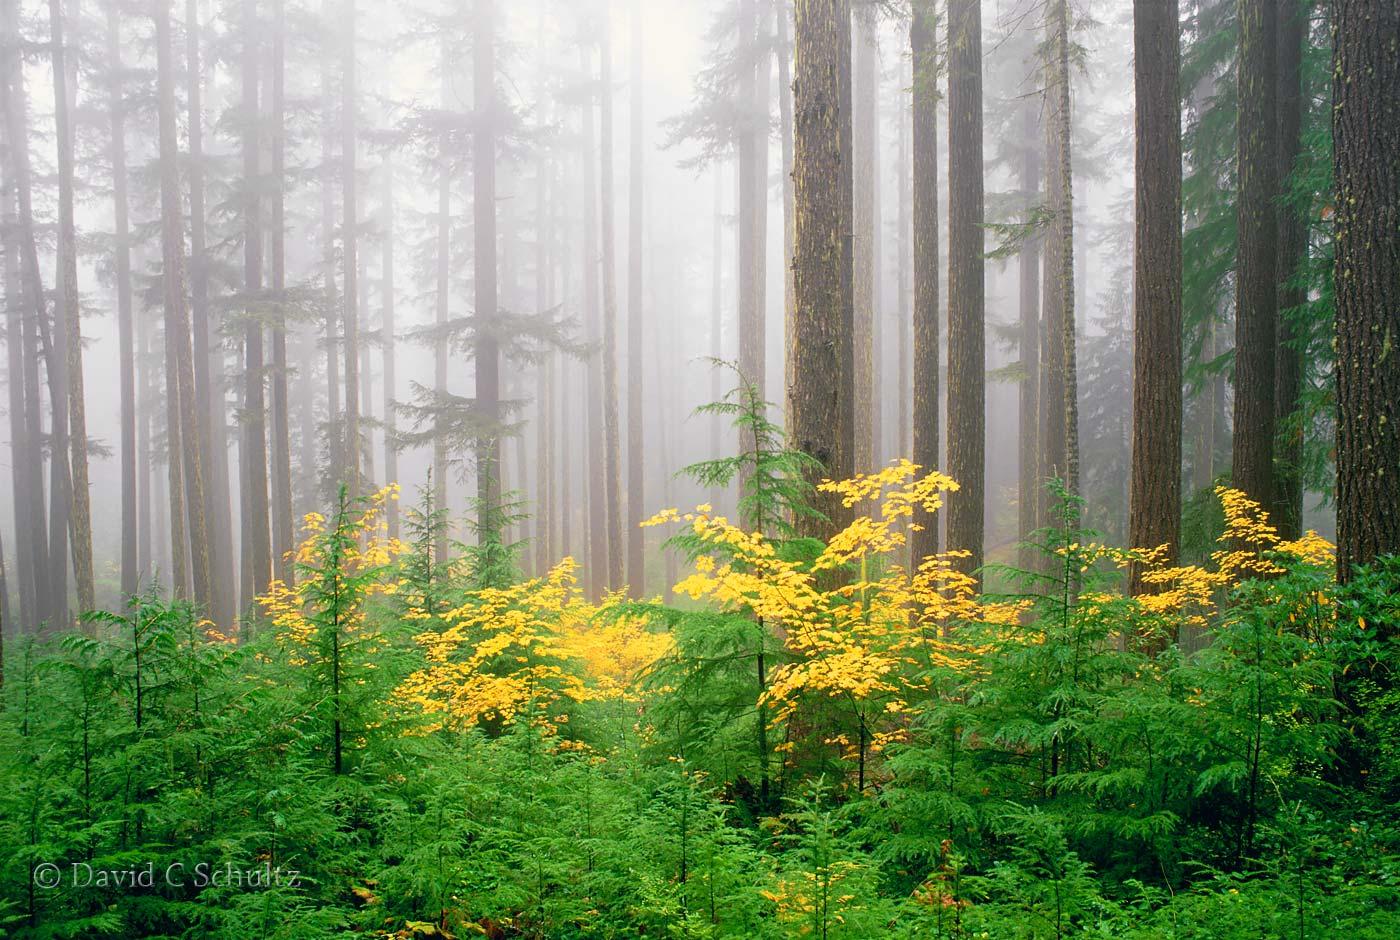 Umpqua National Forest in the fall, Oregon - Image #3-2097